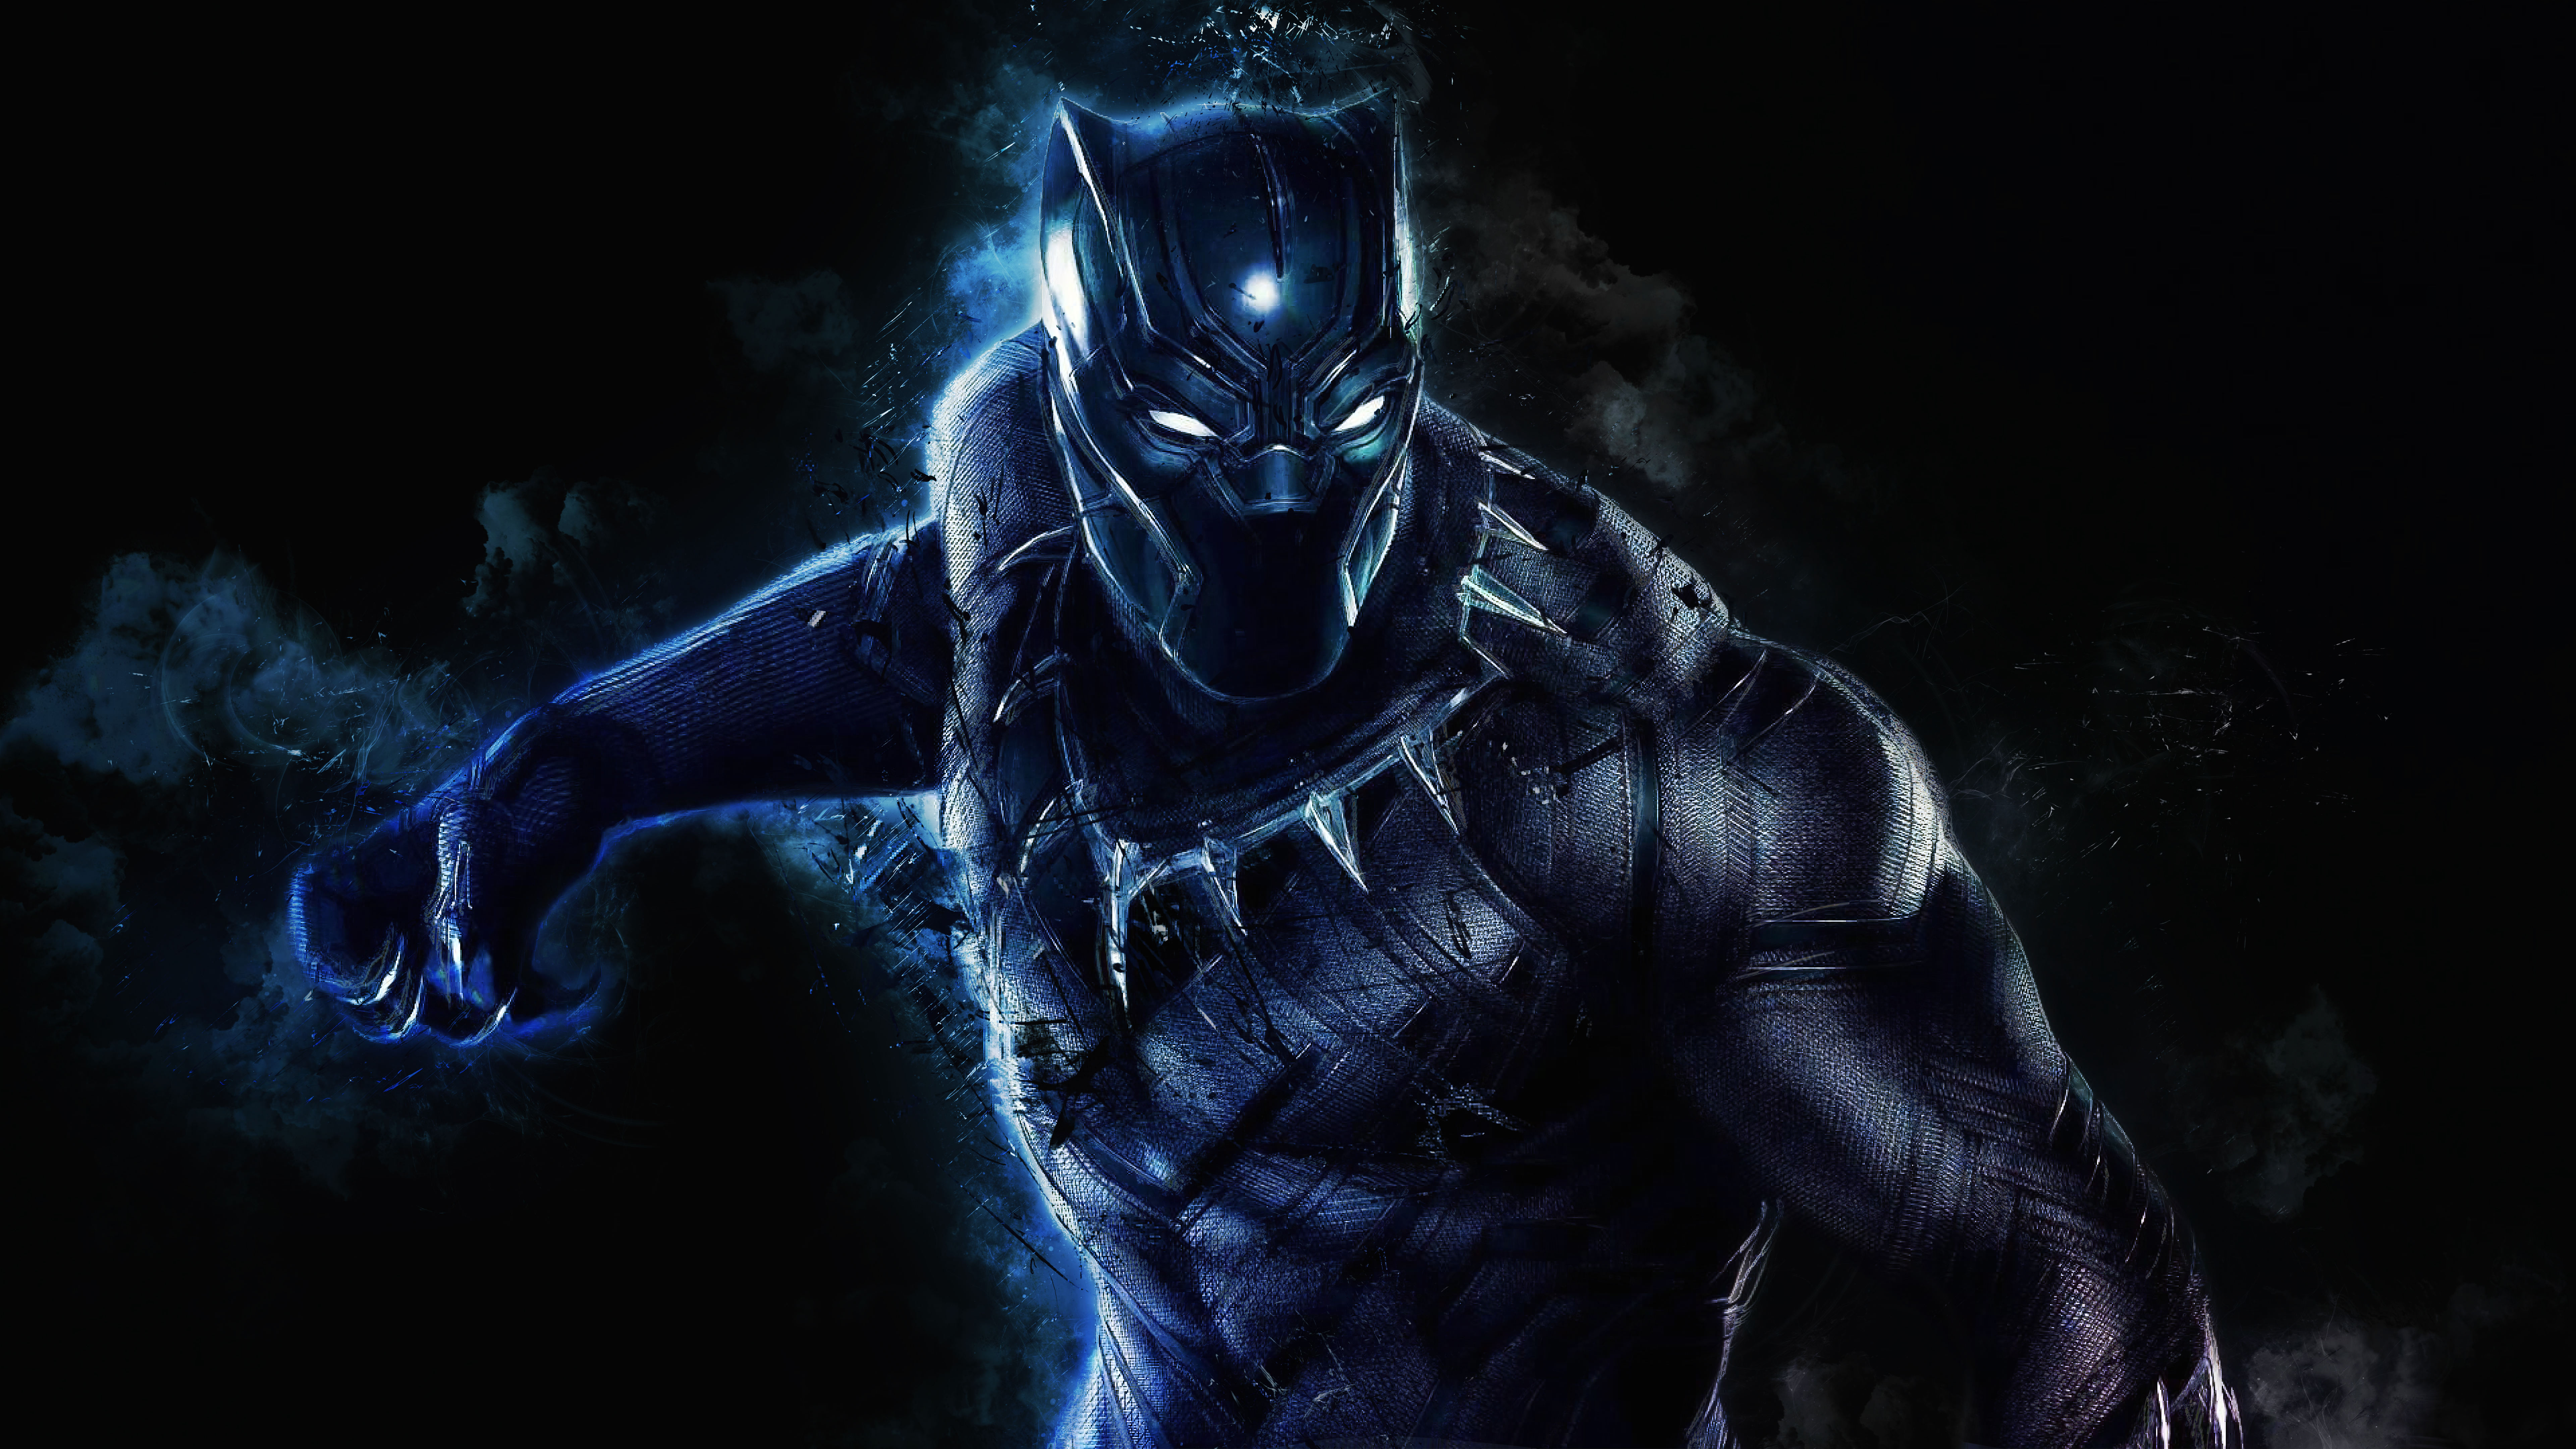 4k Black Panther Wallpaper Hd